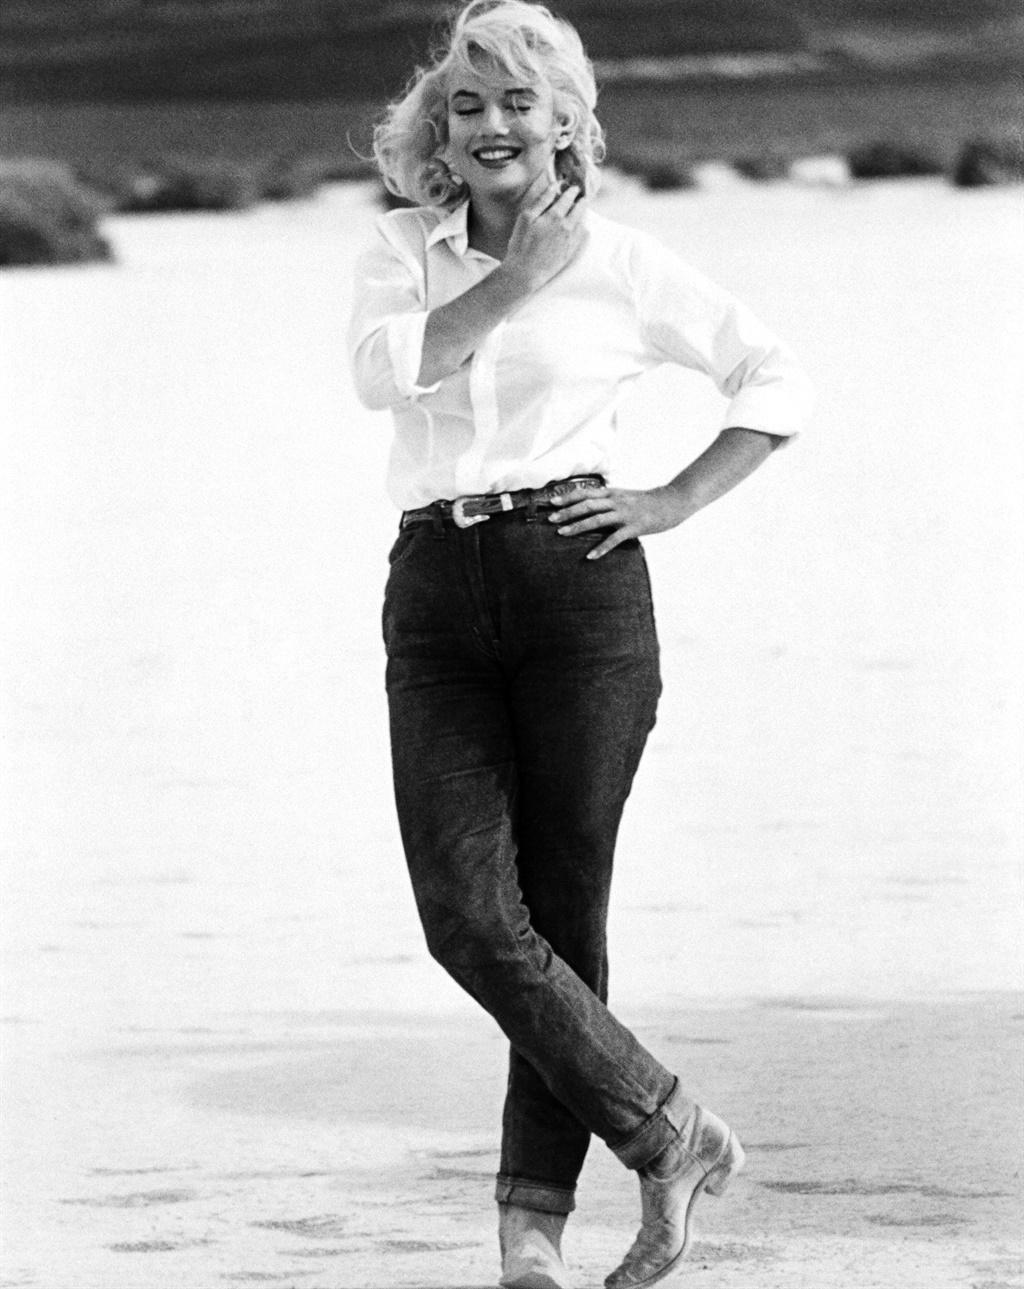 American actress, singer, model and sex symbol Mar